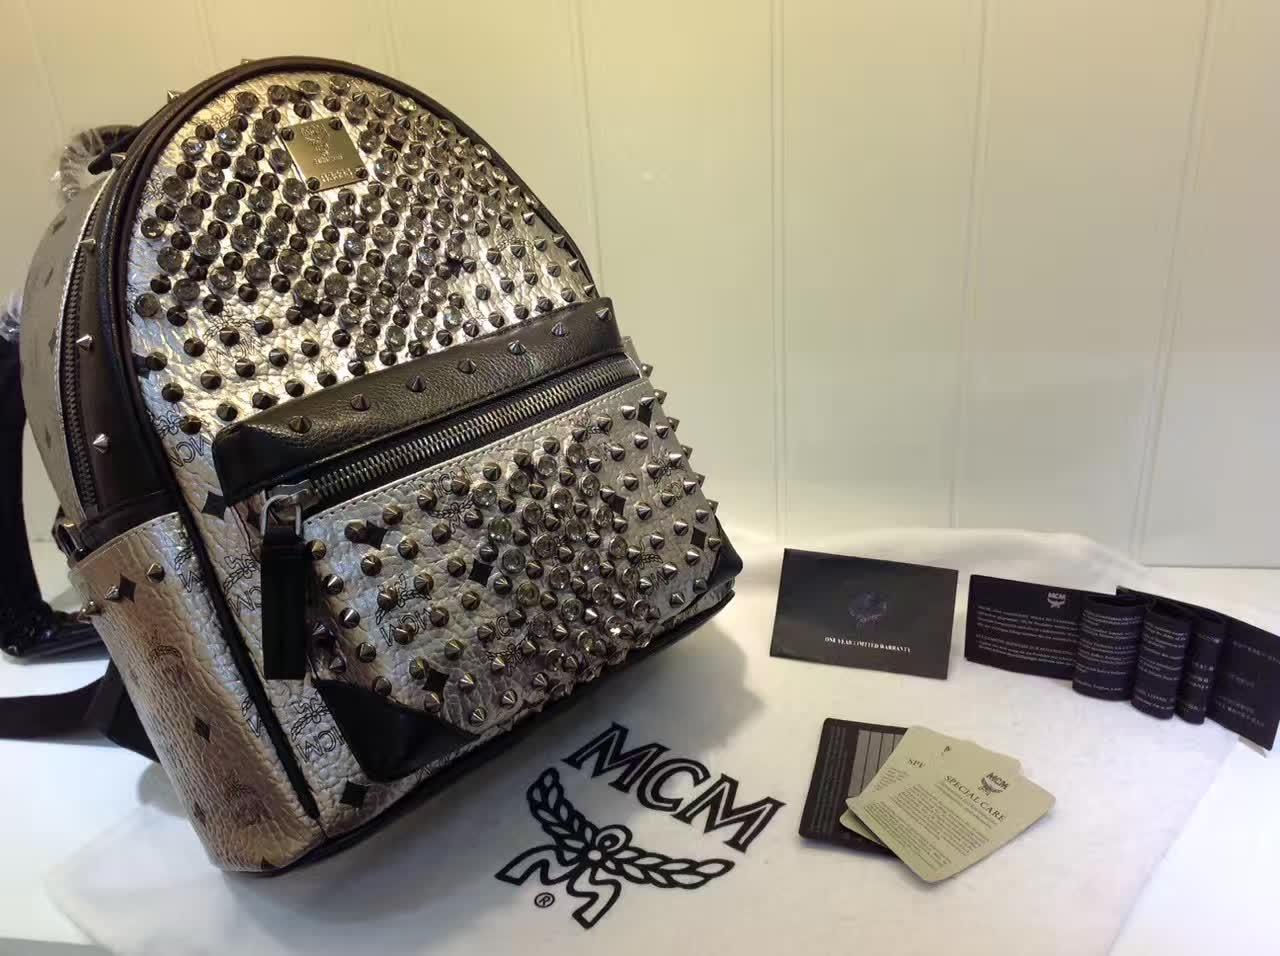 MCM包包批发 BIONIC系列背包 全新金属牌 耐用绒布内里 ykk拉链头配U型扣 银色